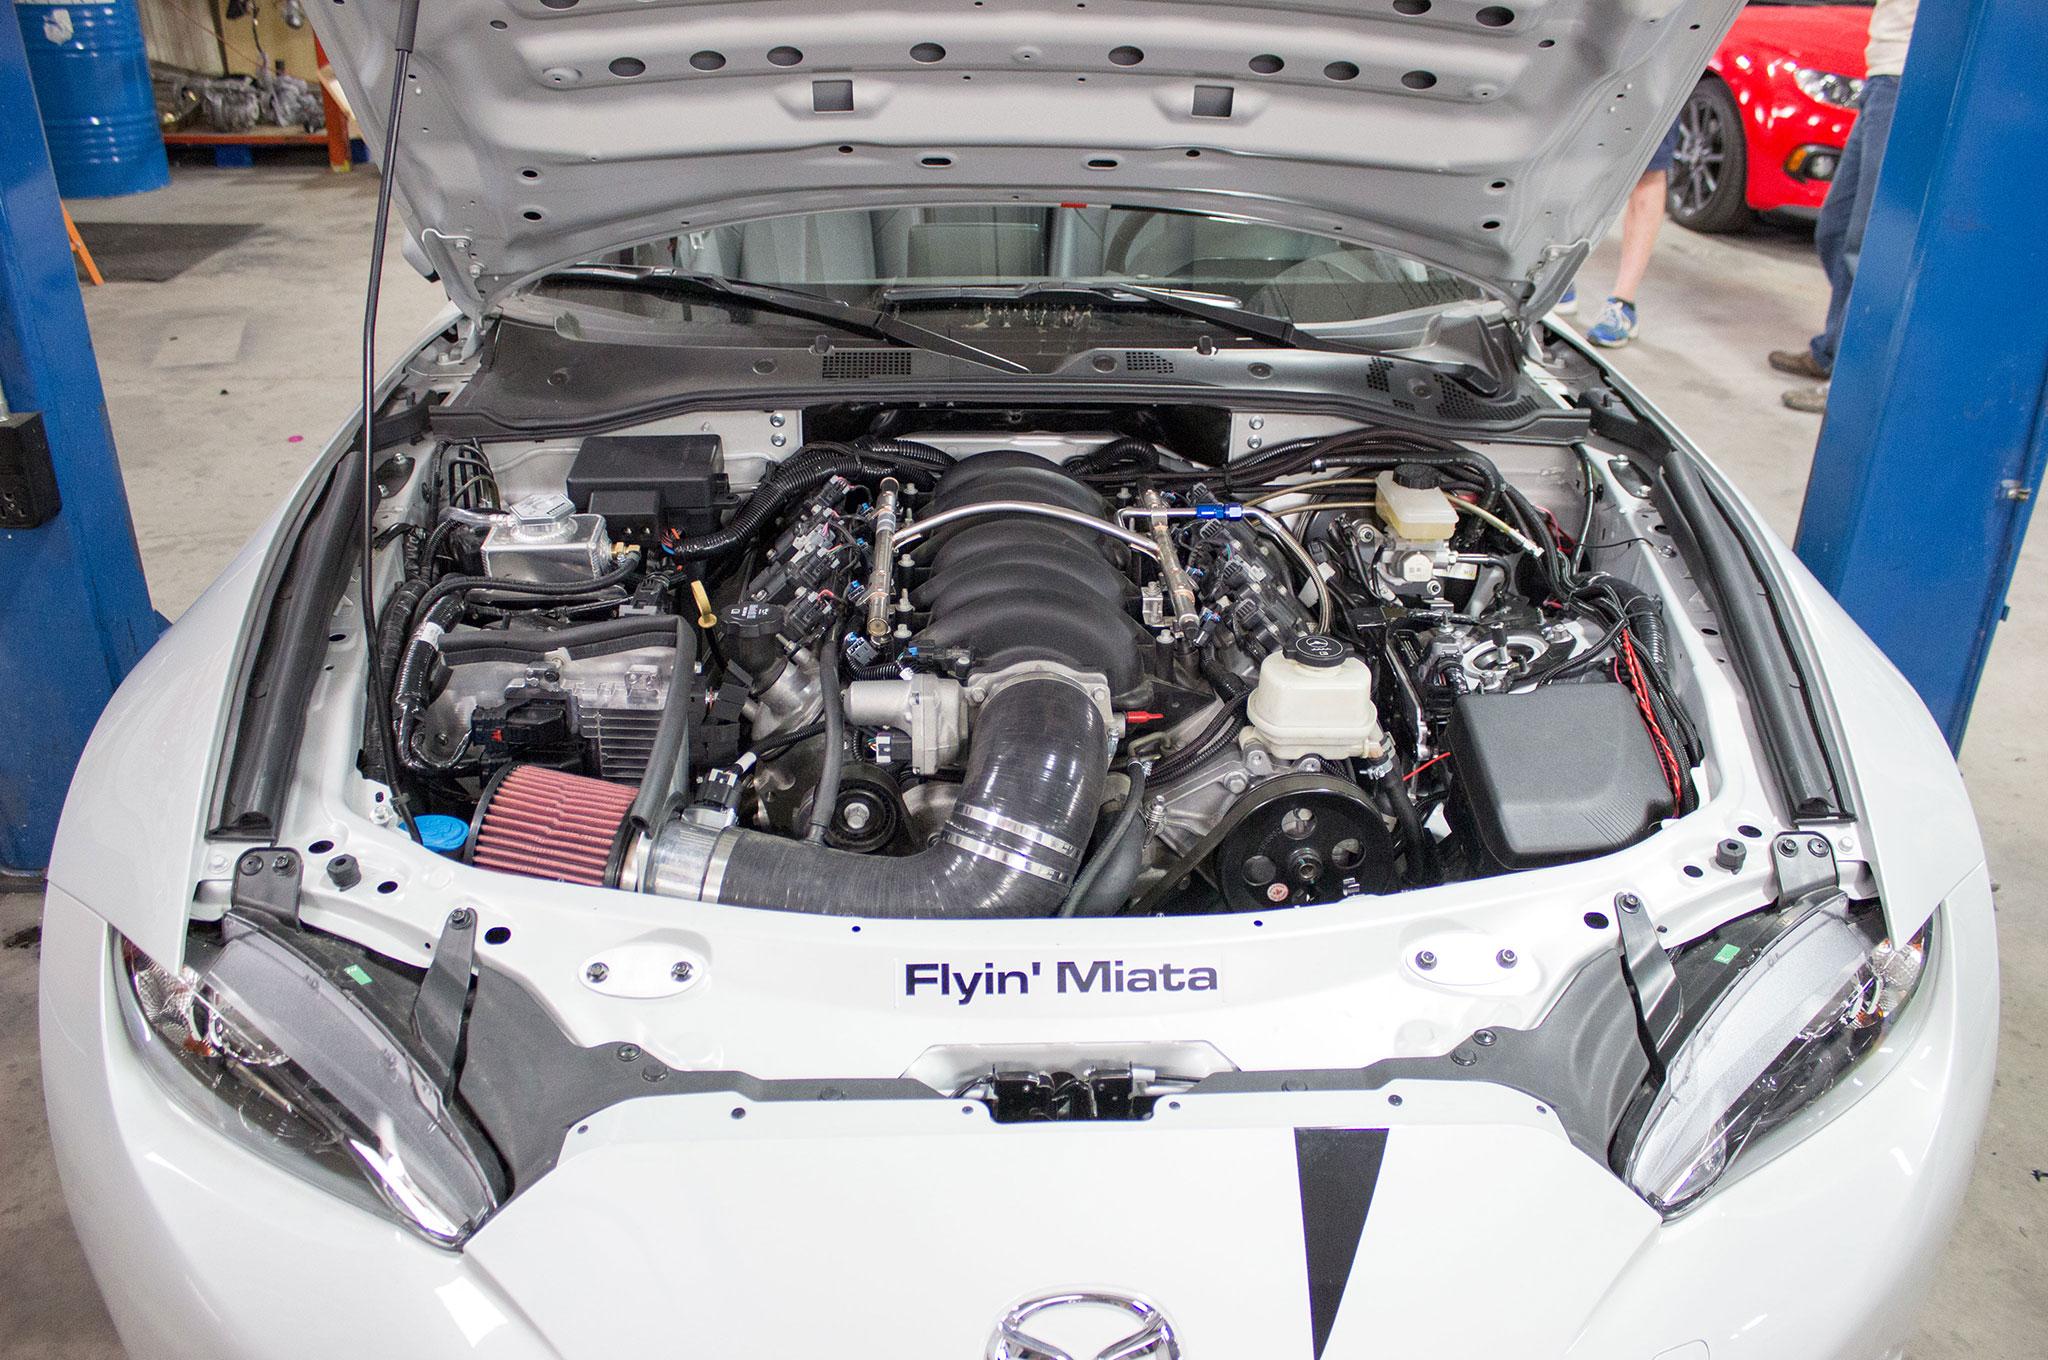 Flyin' Miata Ready to Convert Your 2016 Mazda Miata to V-8 Power on